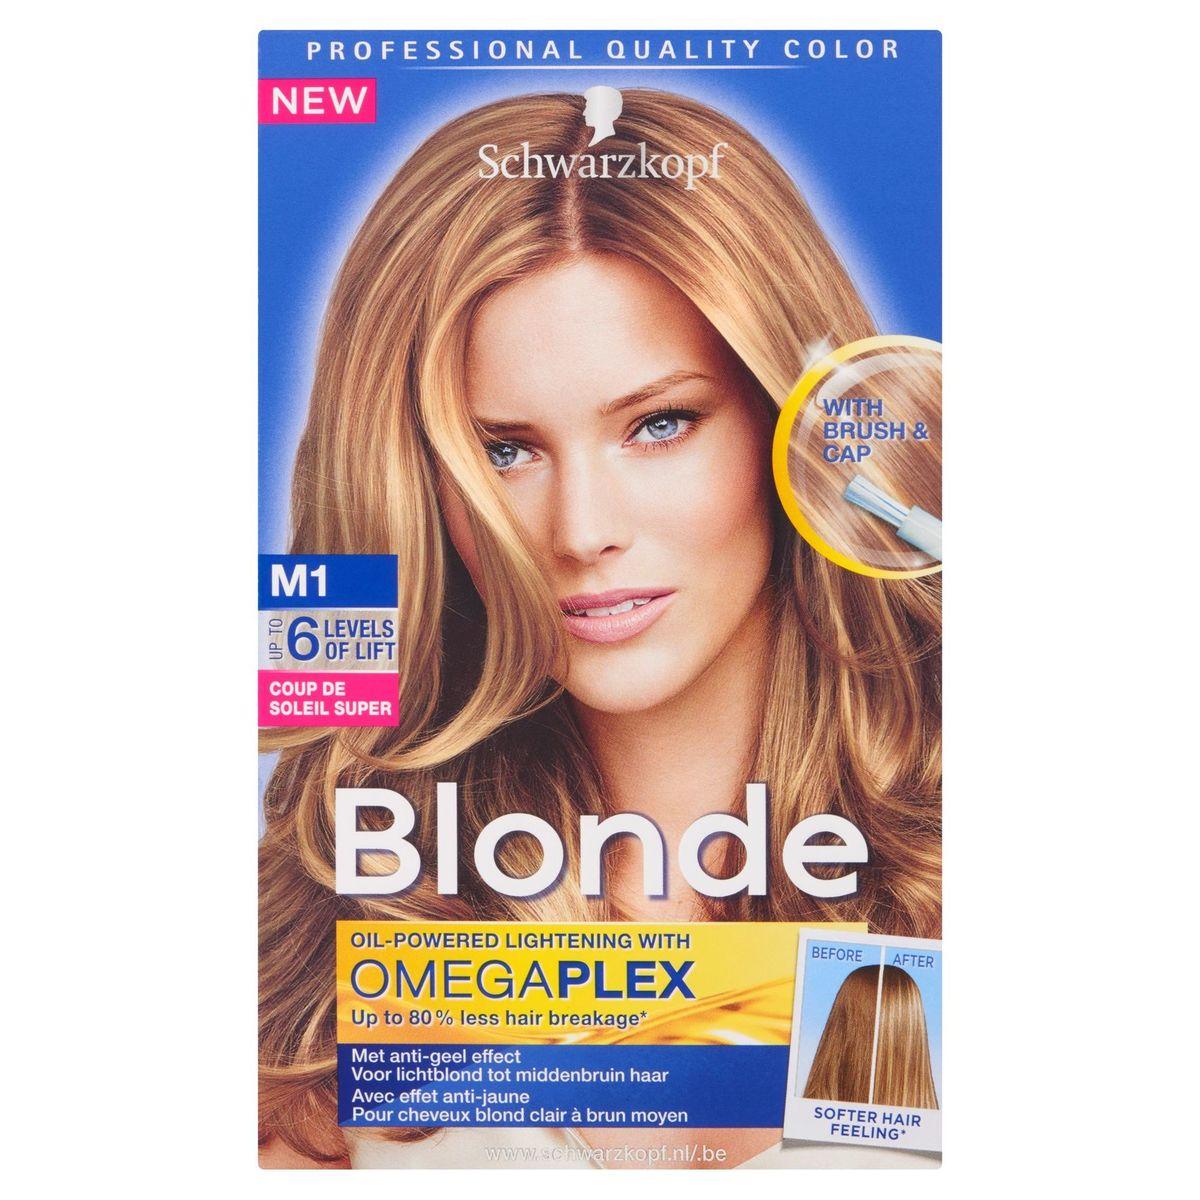 Schwarzkopf Blonde M1 Coup de Soleil Super